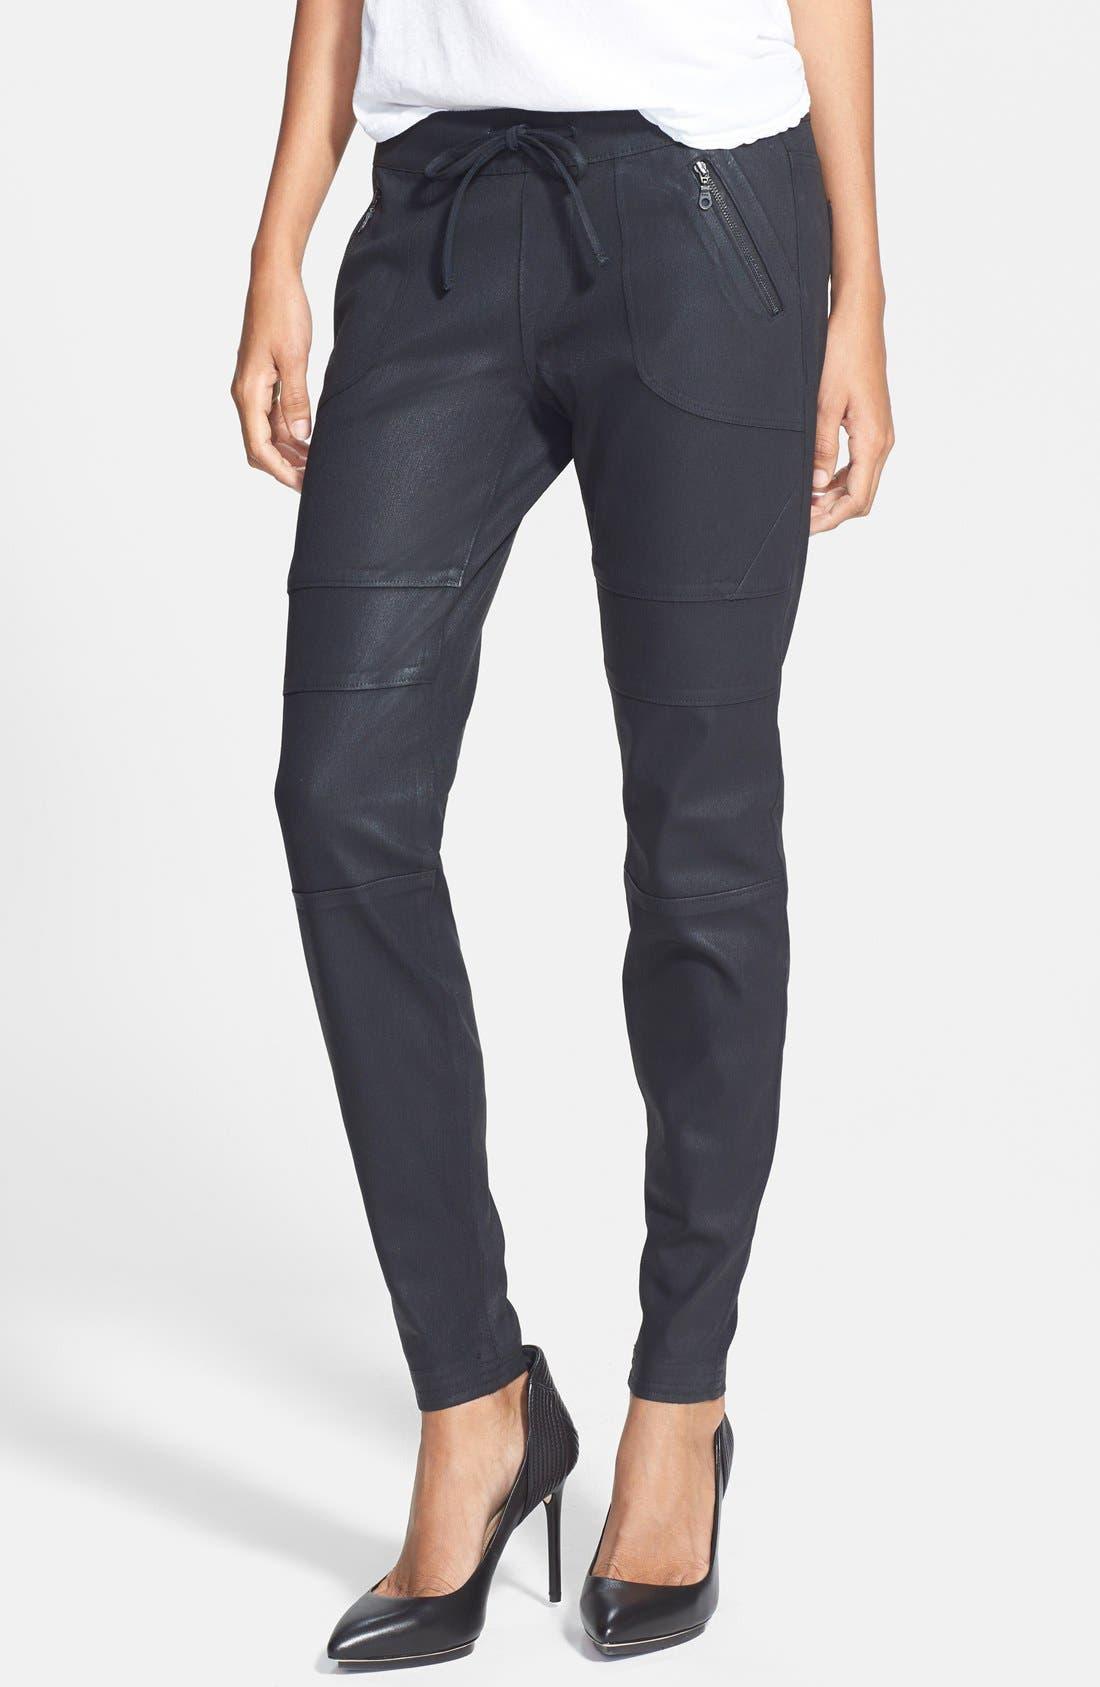 Alternate Image 1 Selected - Kiind Of Jogger Skinny Pants